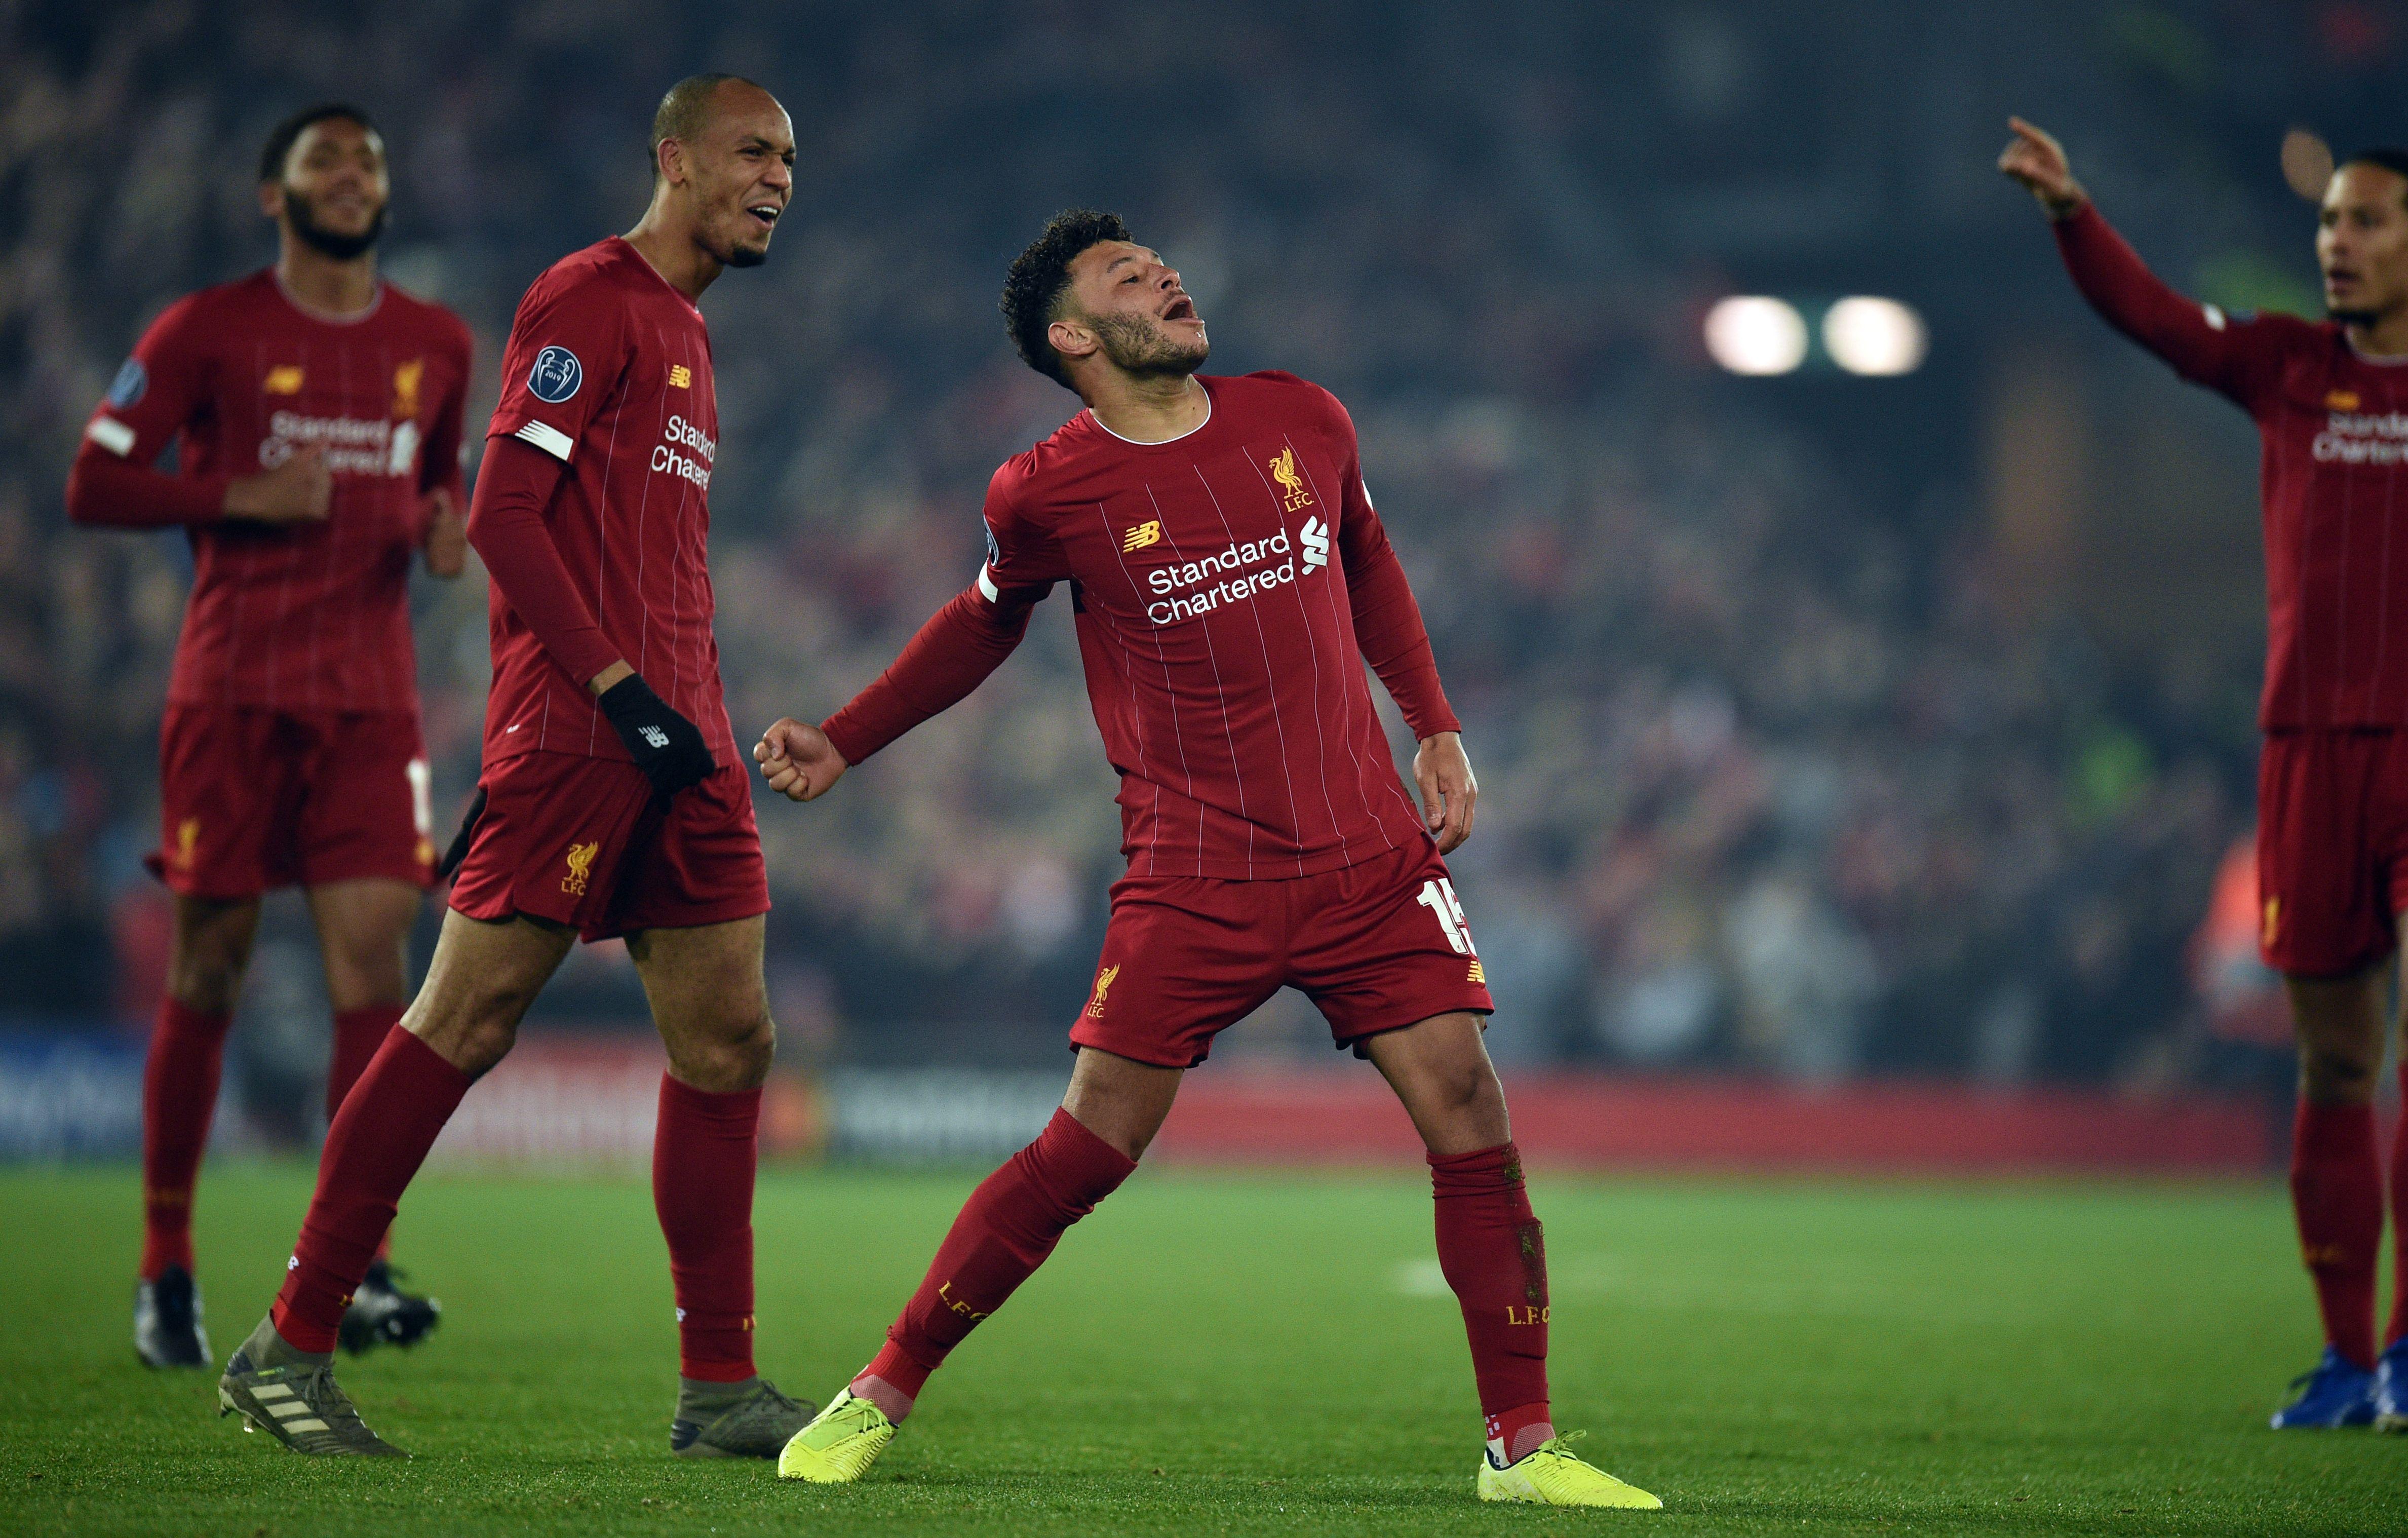 Alex Oxlade-Chamberlain - Liverpool vs Genk